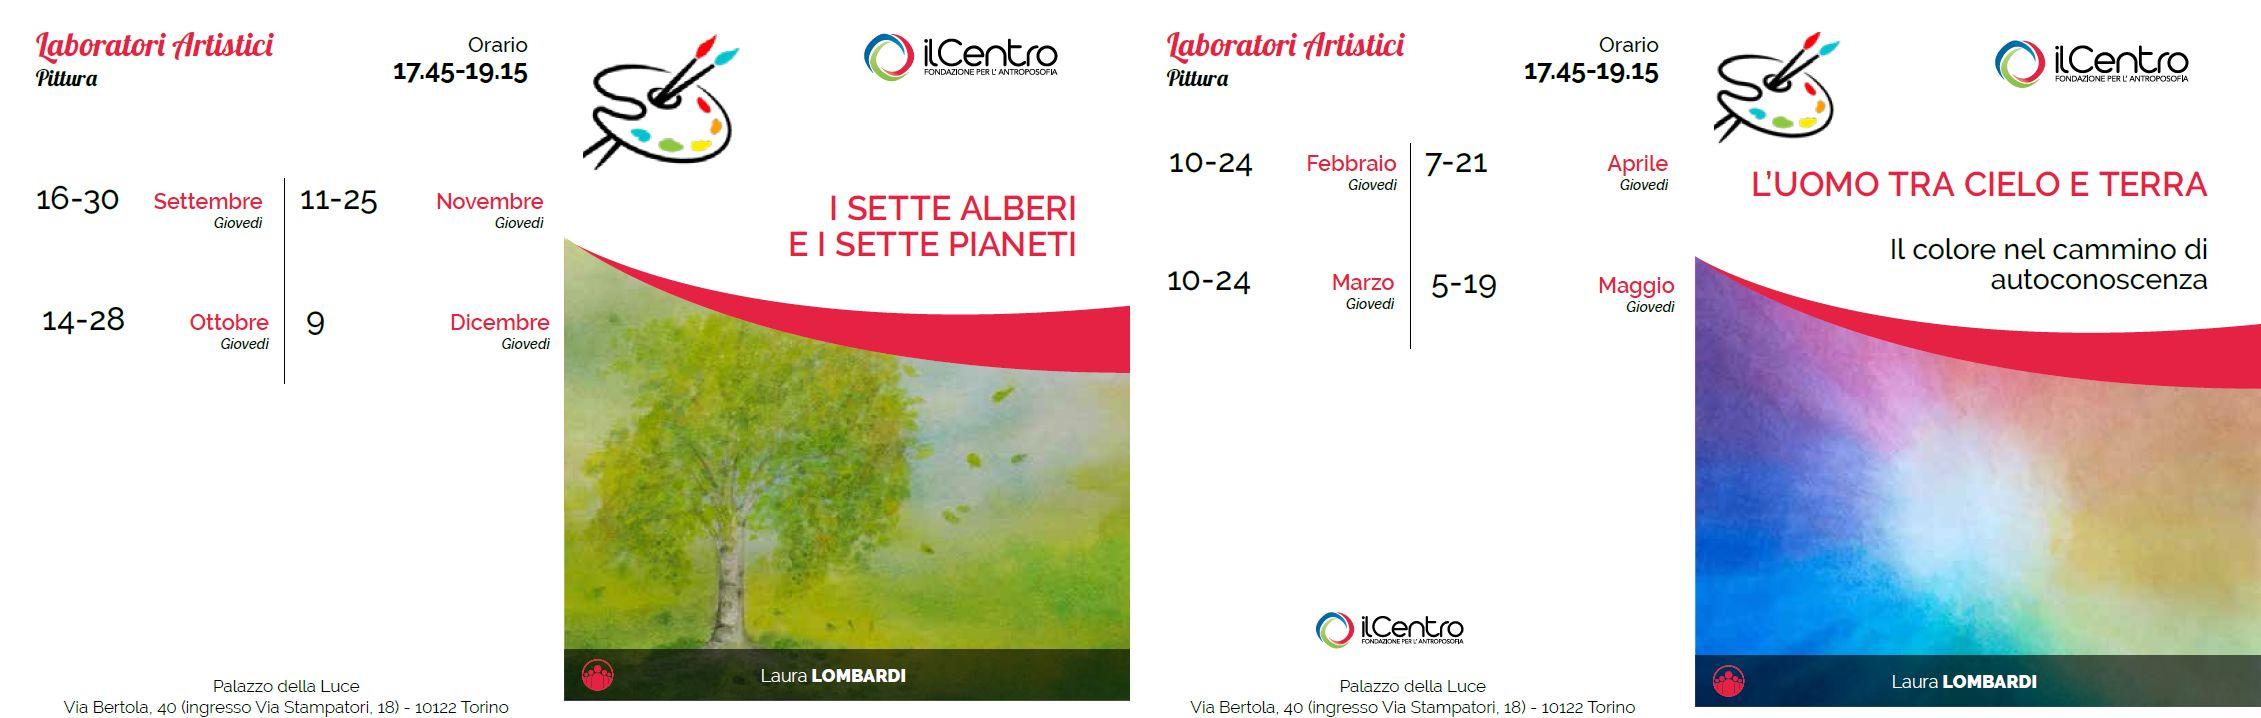 Calendario Laura Lombardi pittura 2021-2022